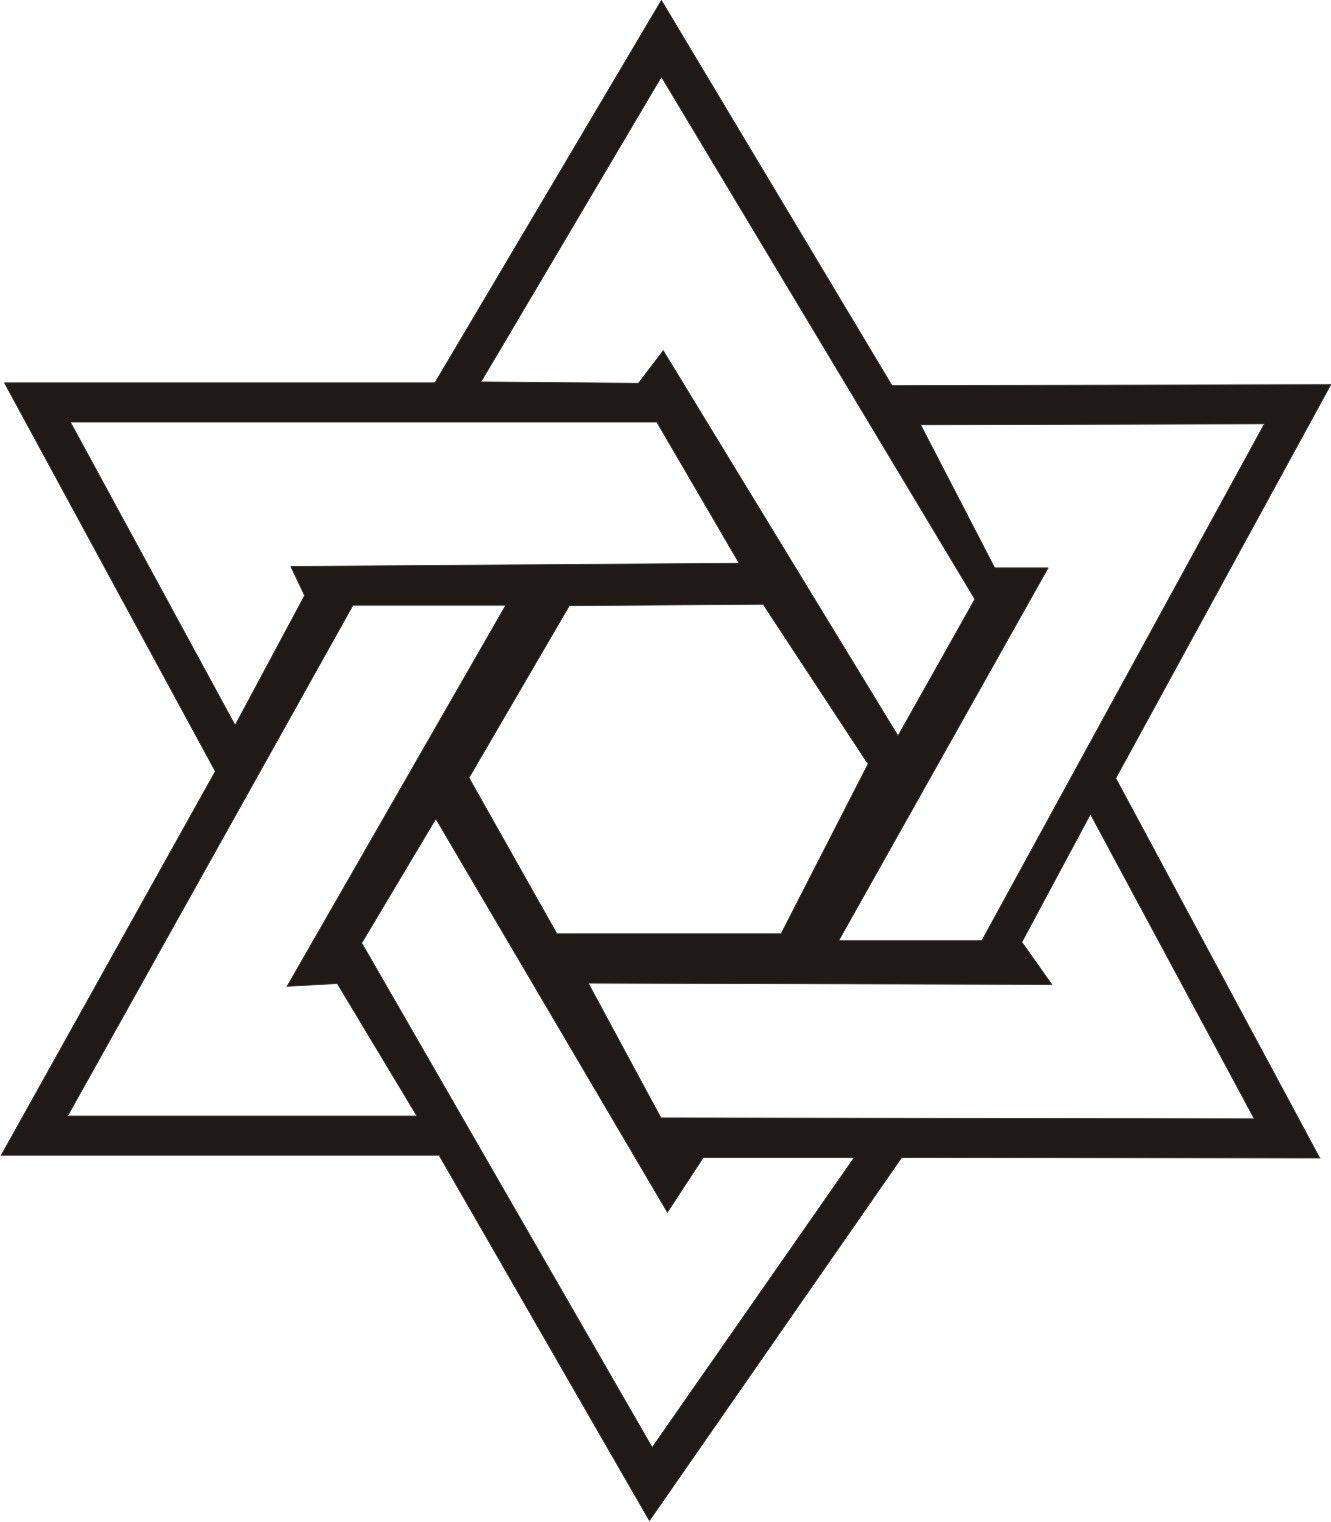 david star vector buscar con google arte judaico pinterest rh pinterest com Star Wars Silhouette Clip Art Stairs Silhouette Clip Art